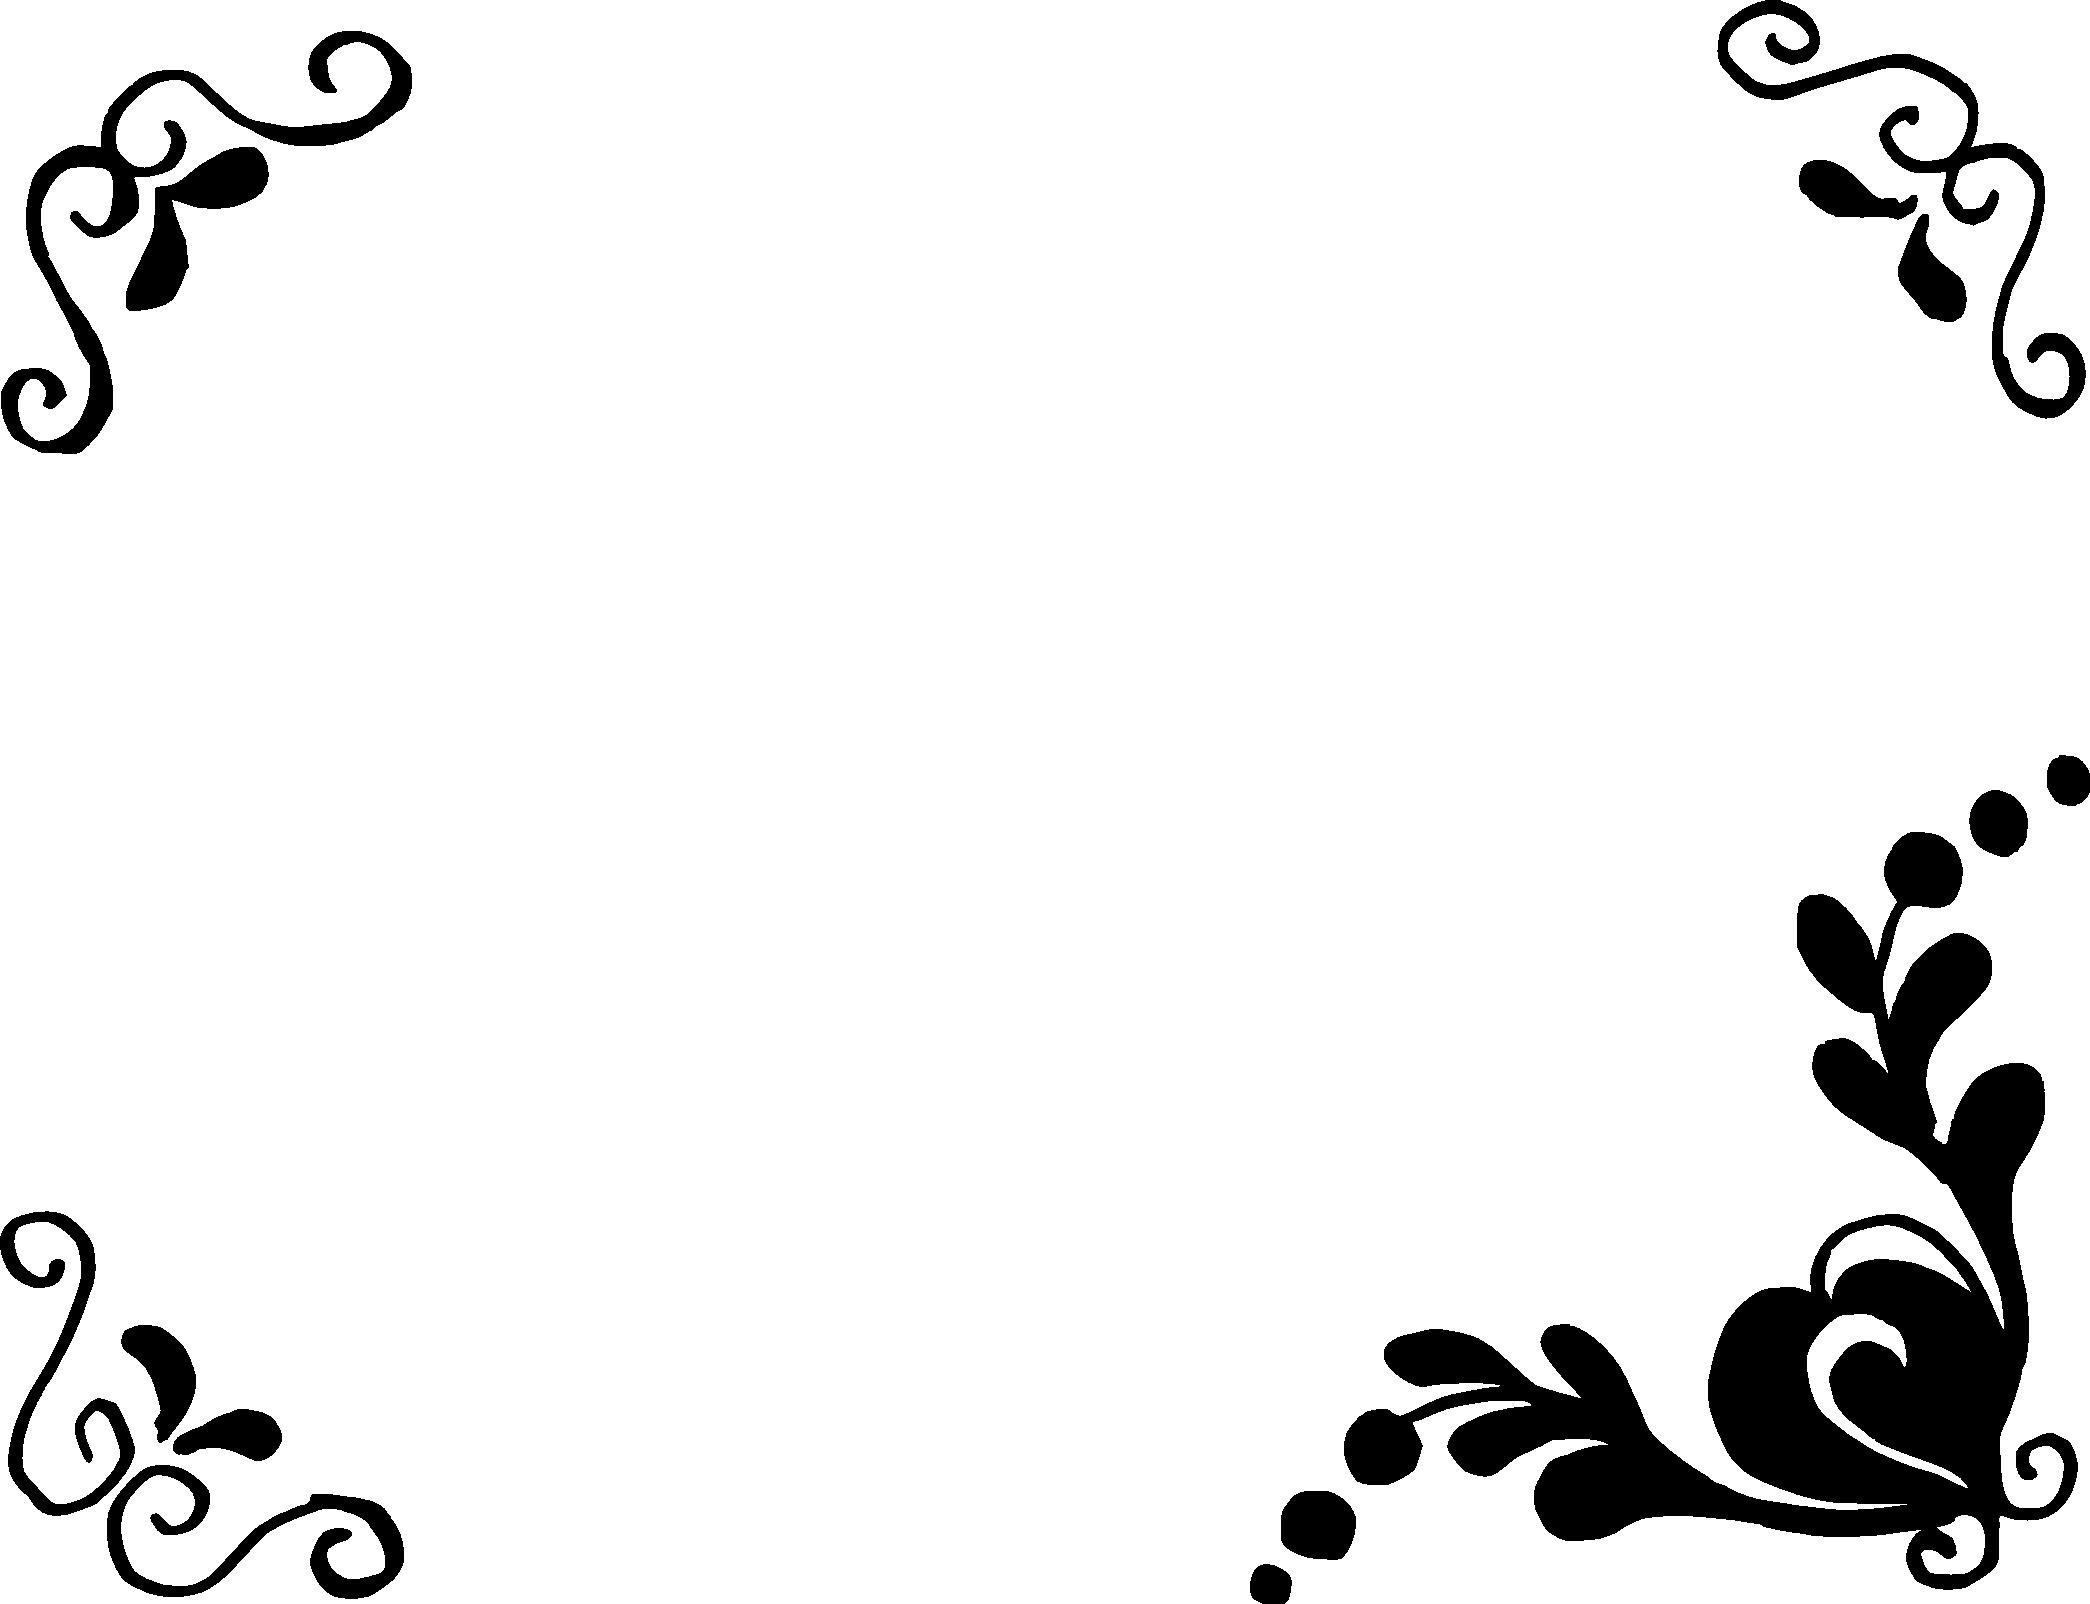 8 Simple Flower Frame Png Transparent Onlygfx Com